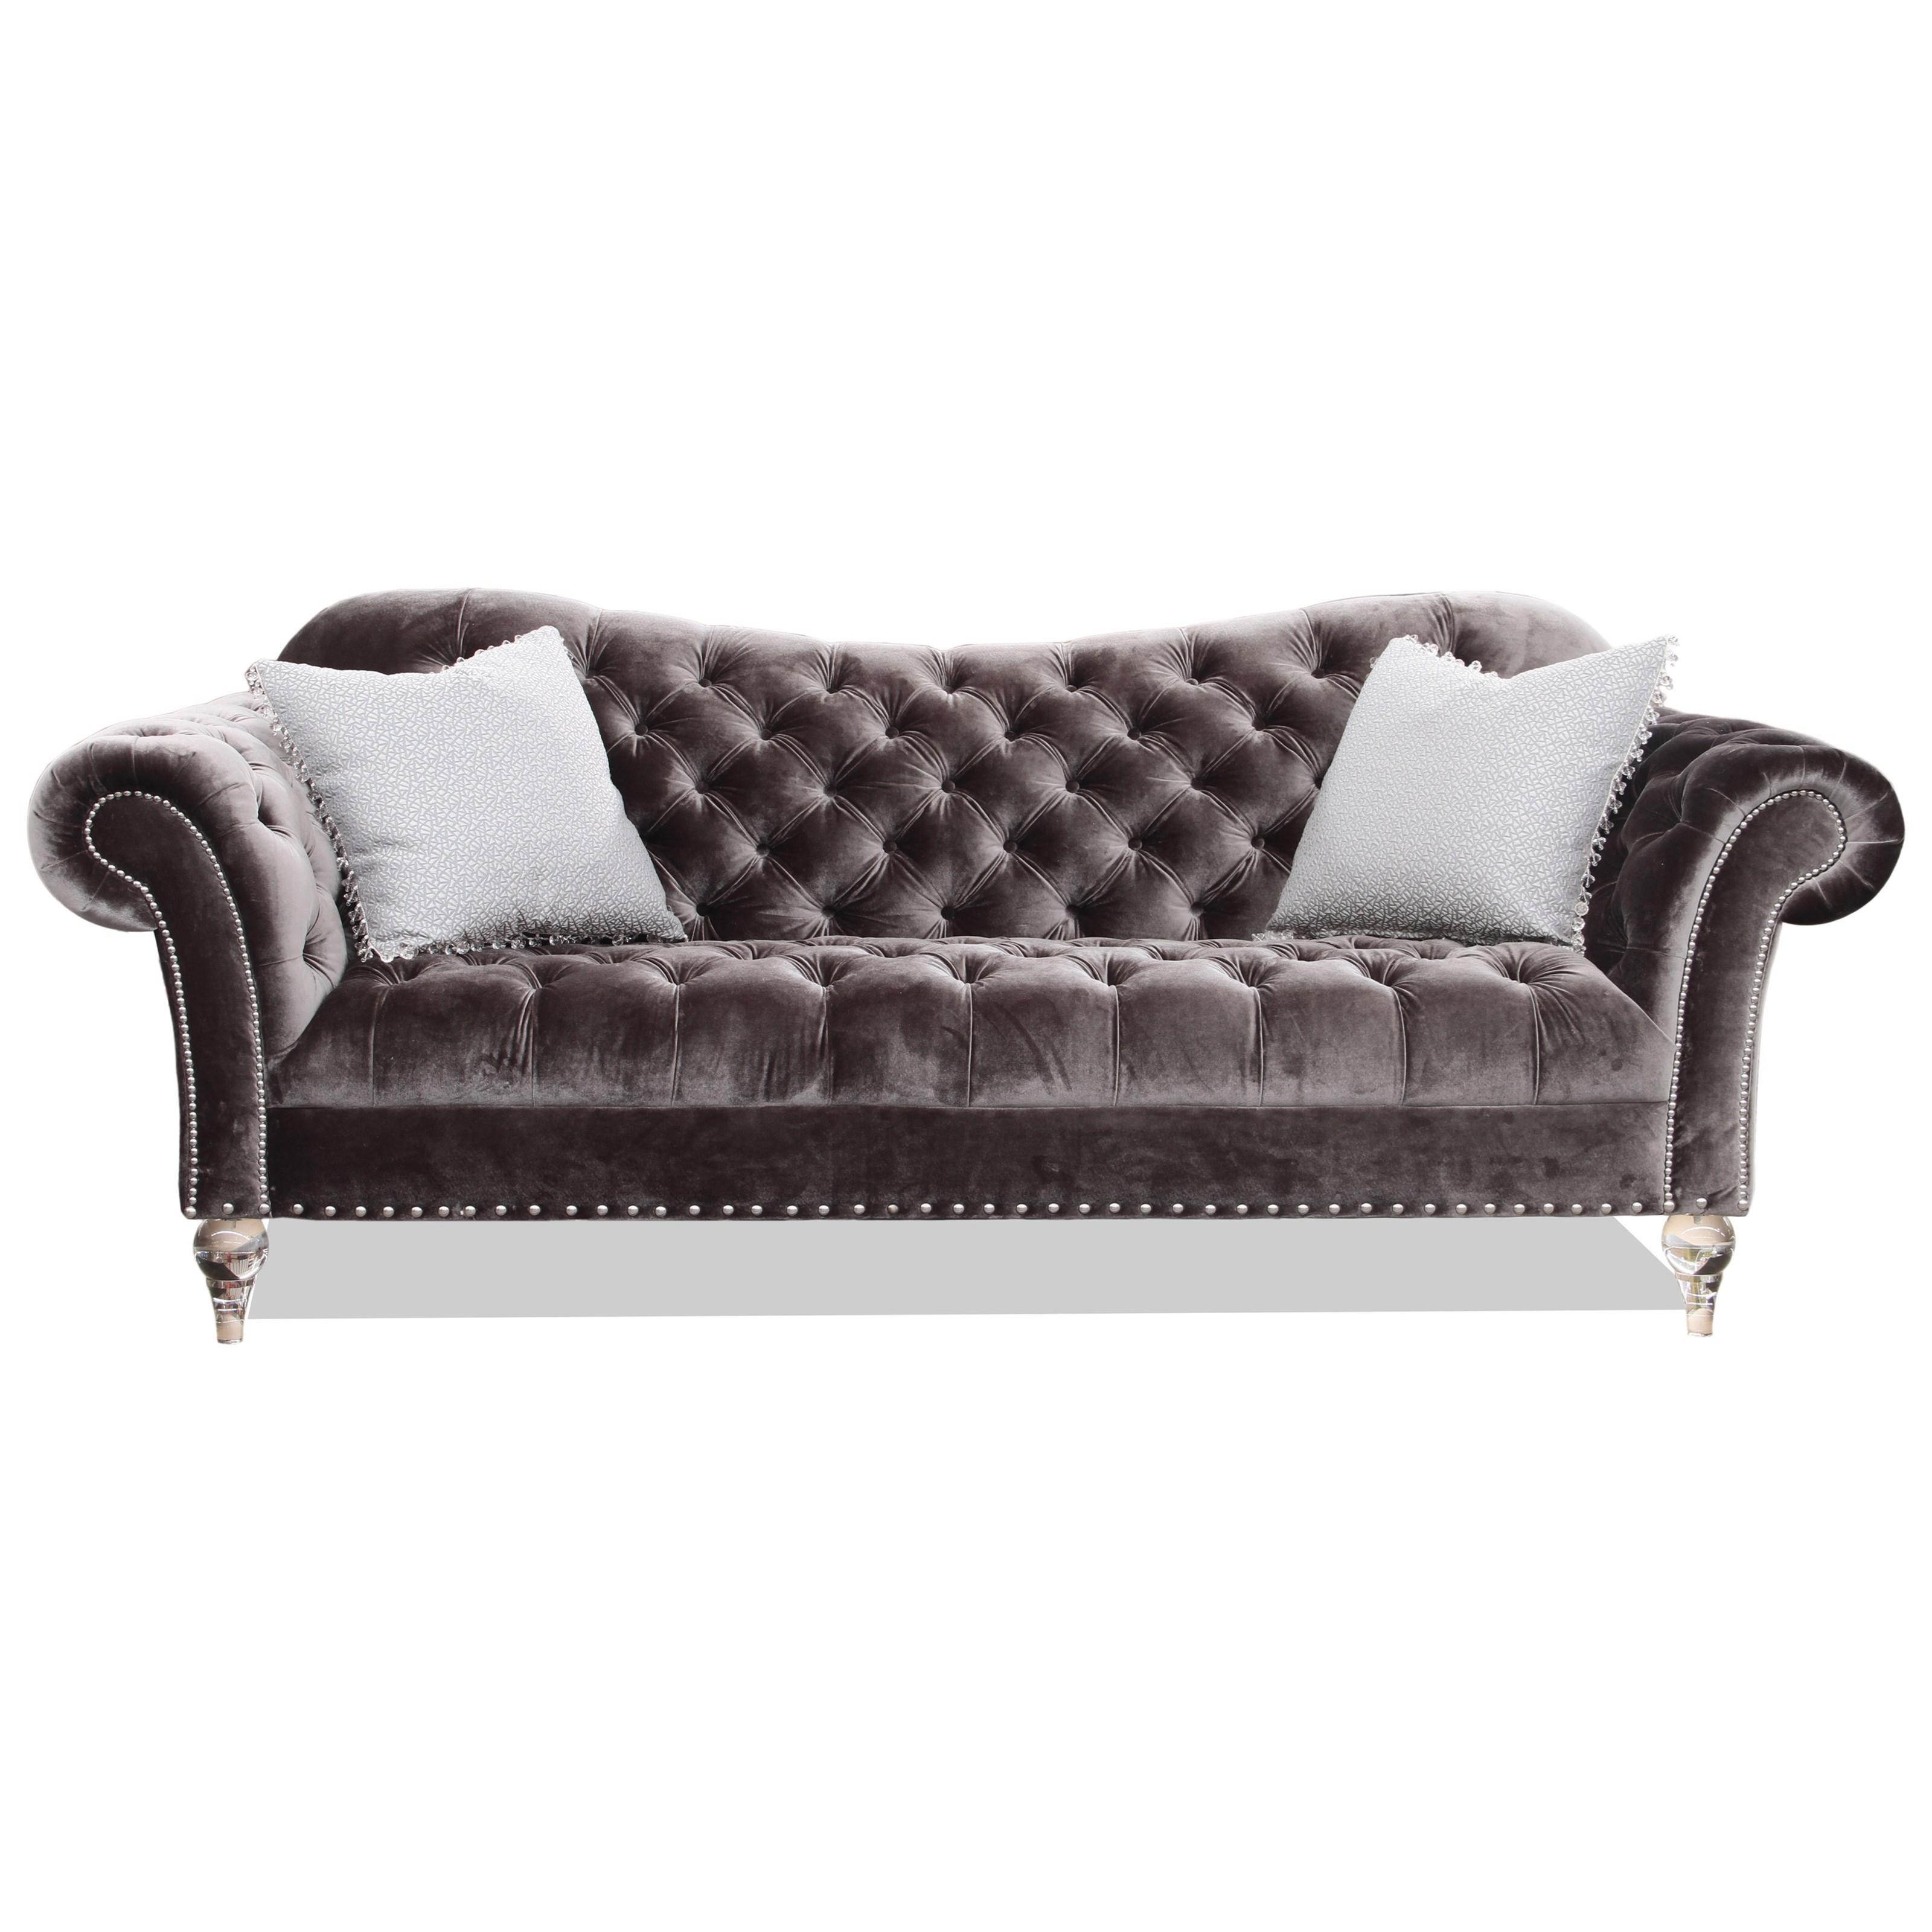 Rachlin Classics Vanna Traditional Sofa With Deep Tufted Accents